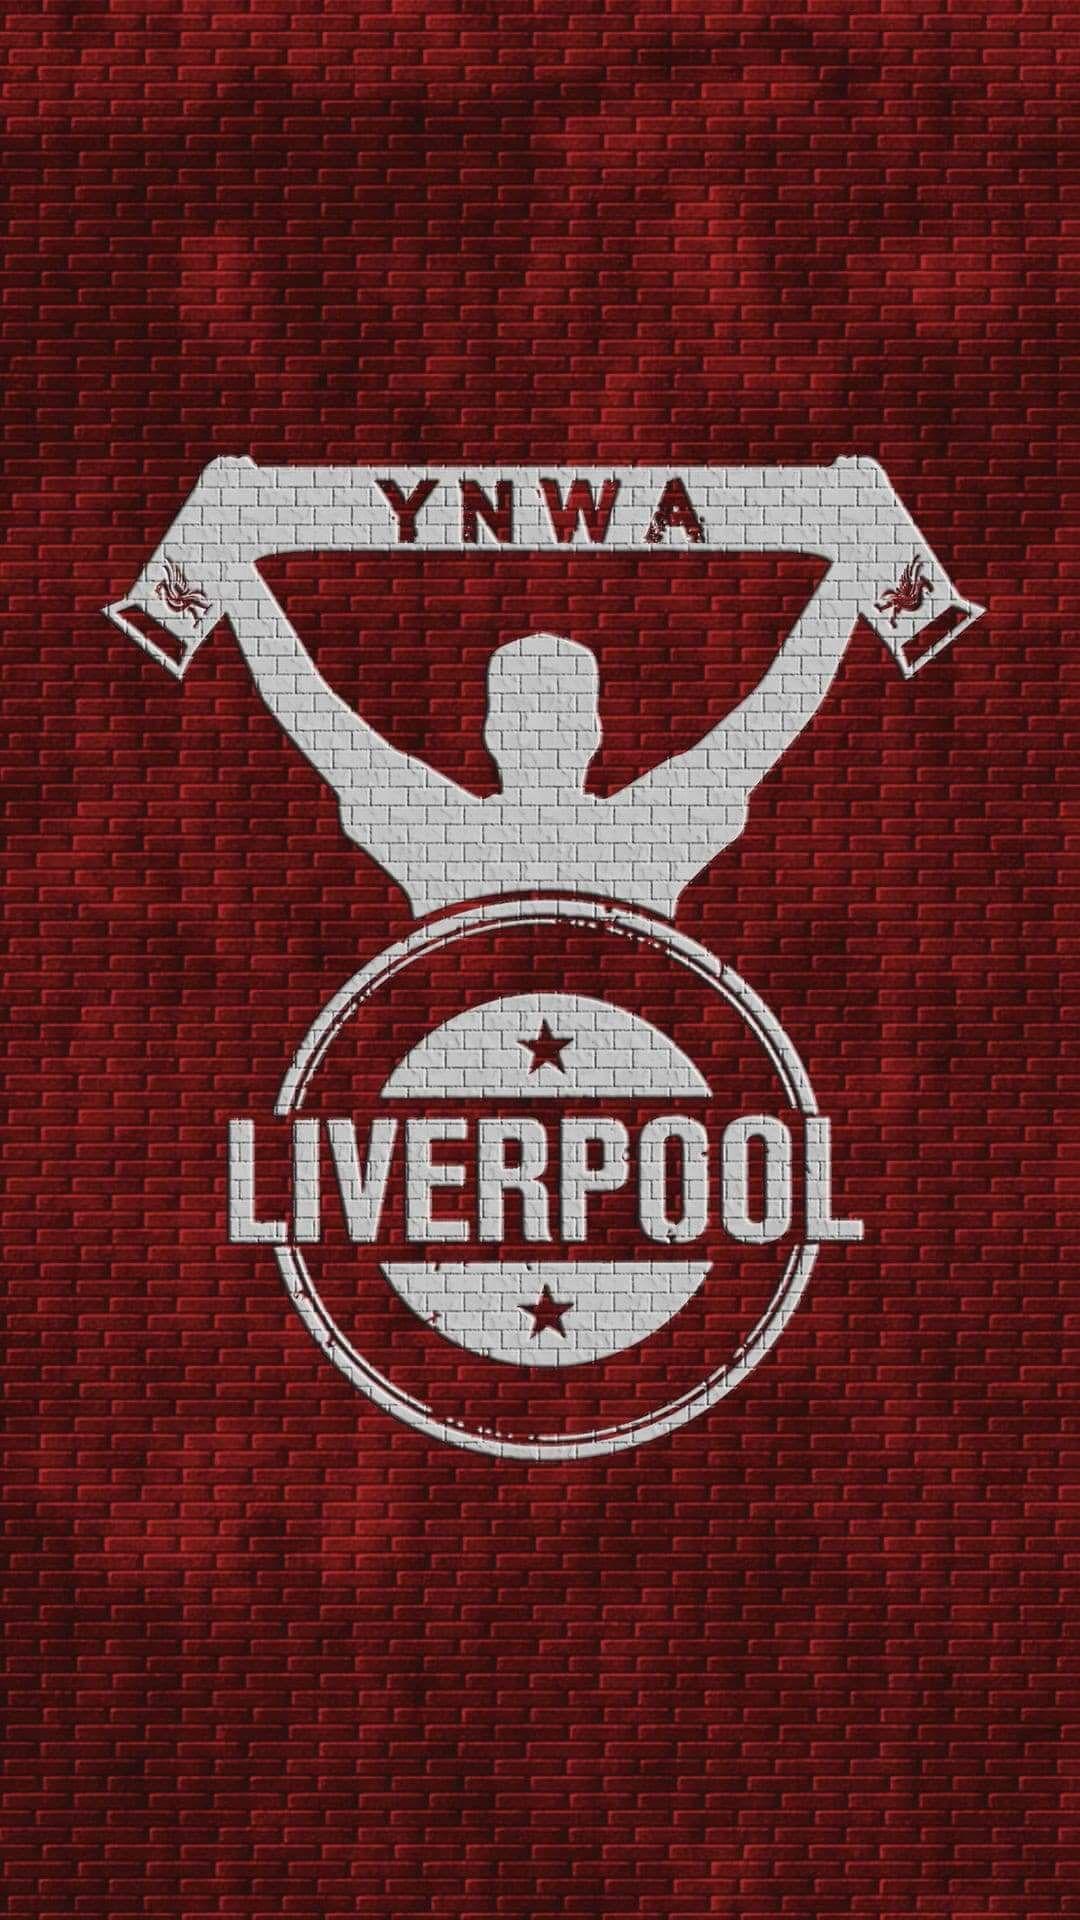 Liverpool Ynwa You Ll Never Walk Alone I Believe That We Will